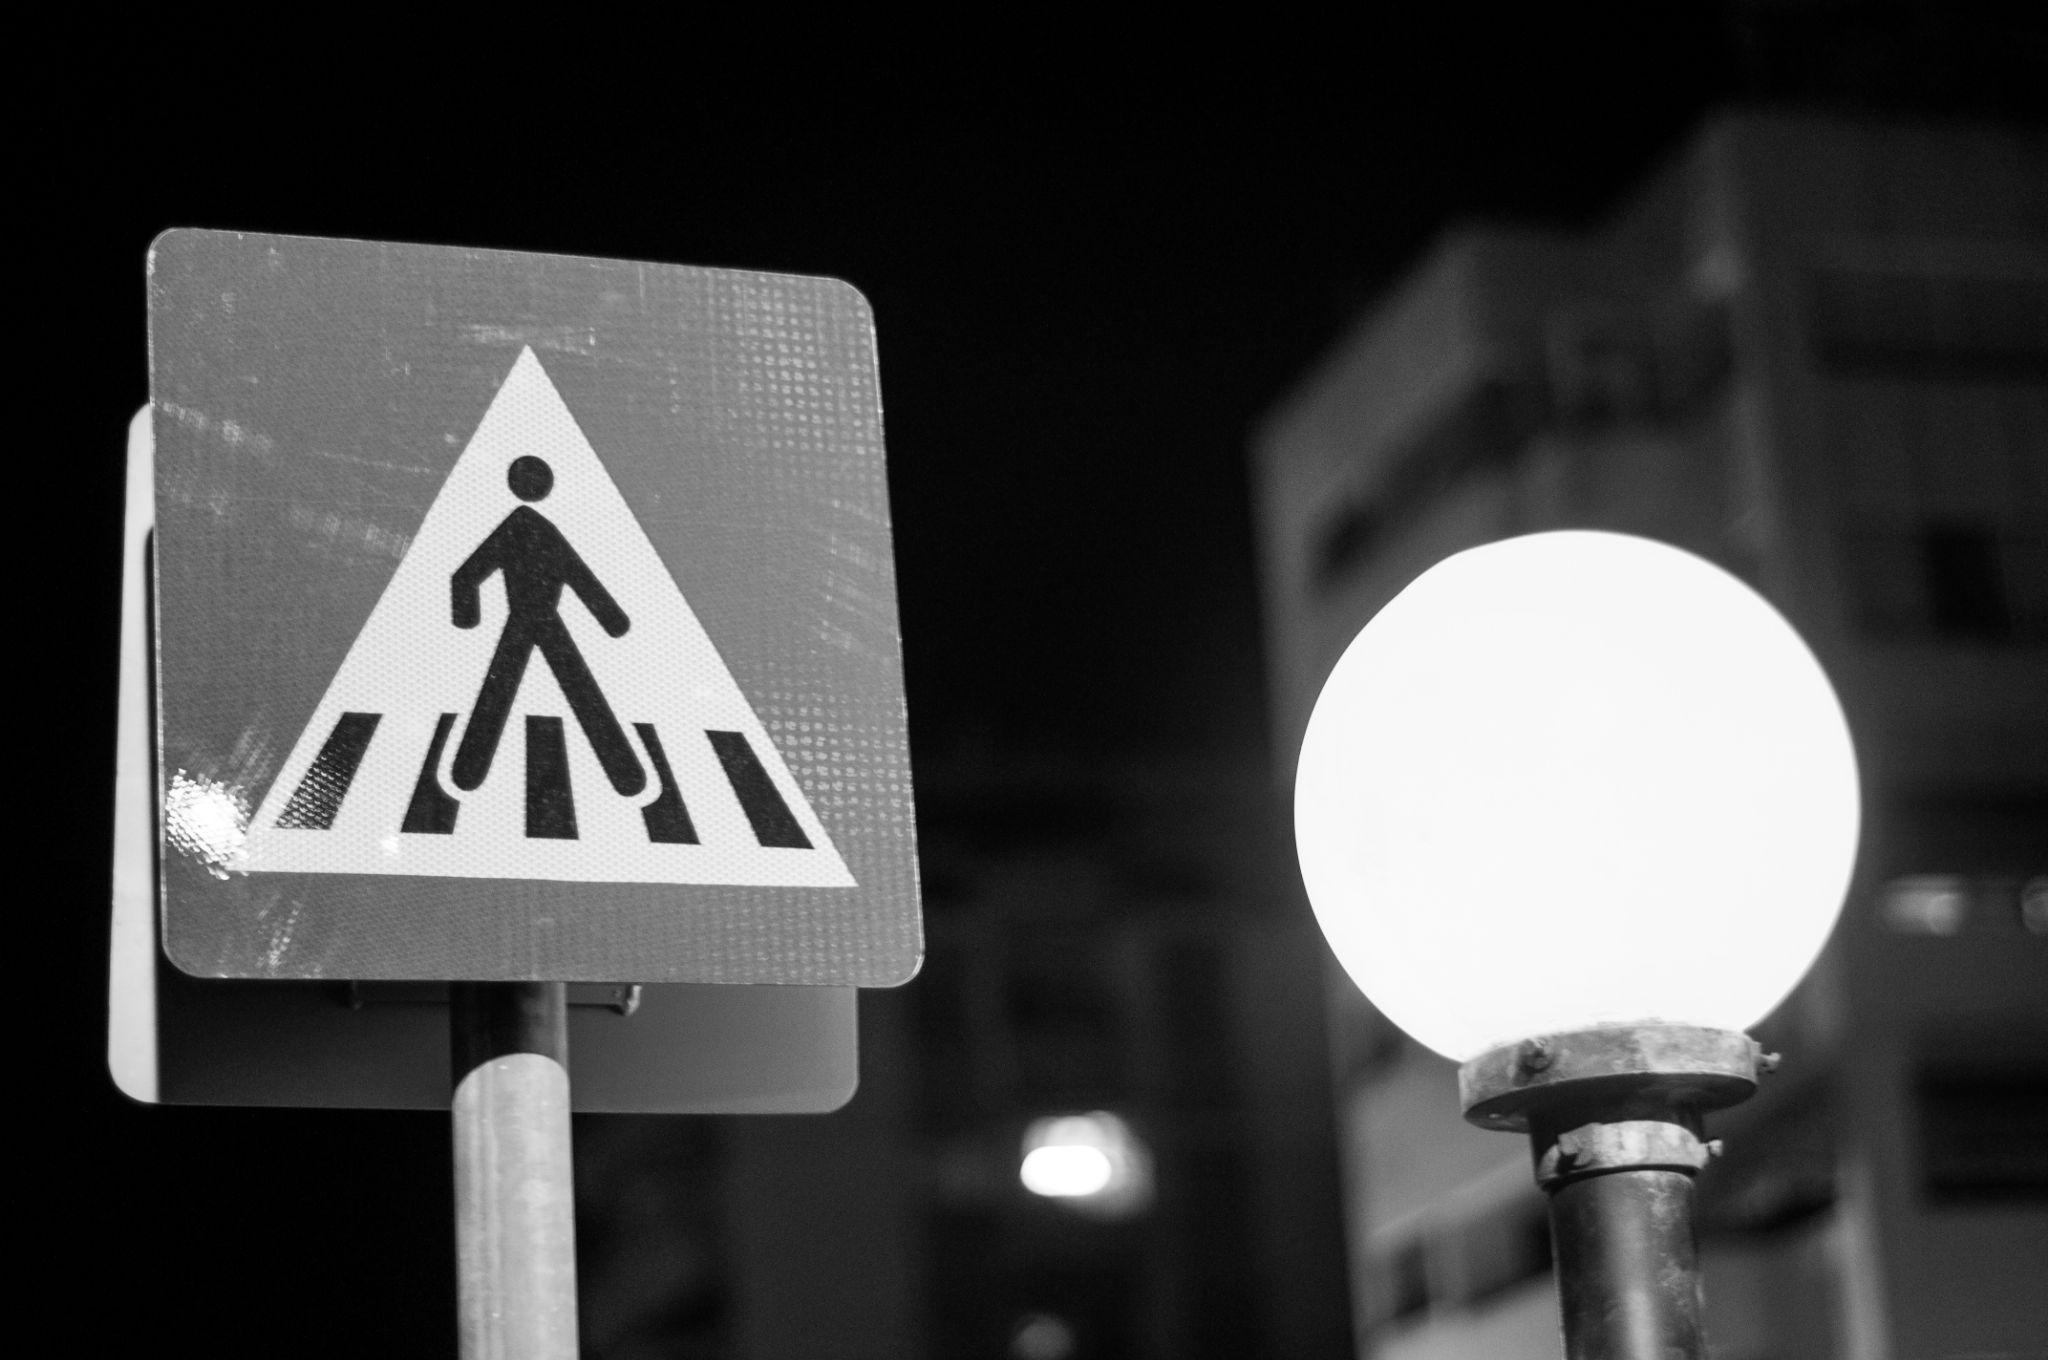 Street Crossing by Dimitris Gkoutzamanis